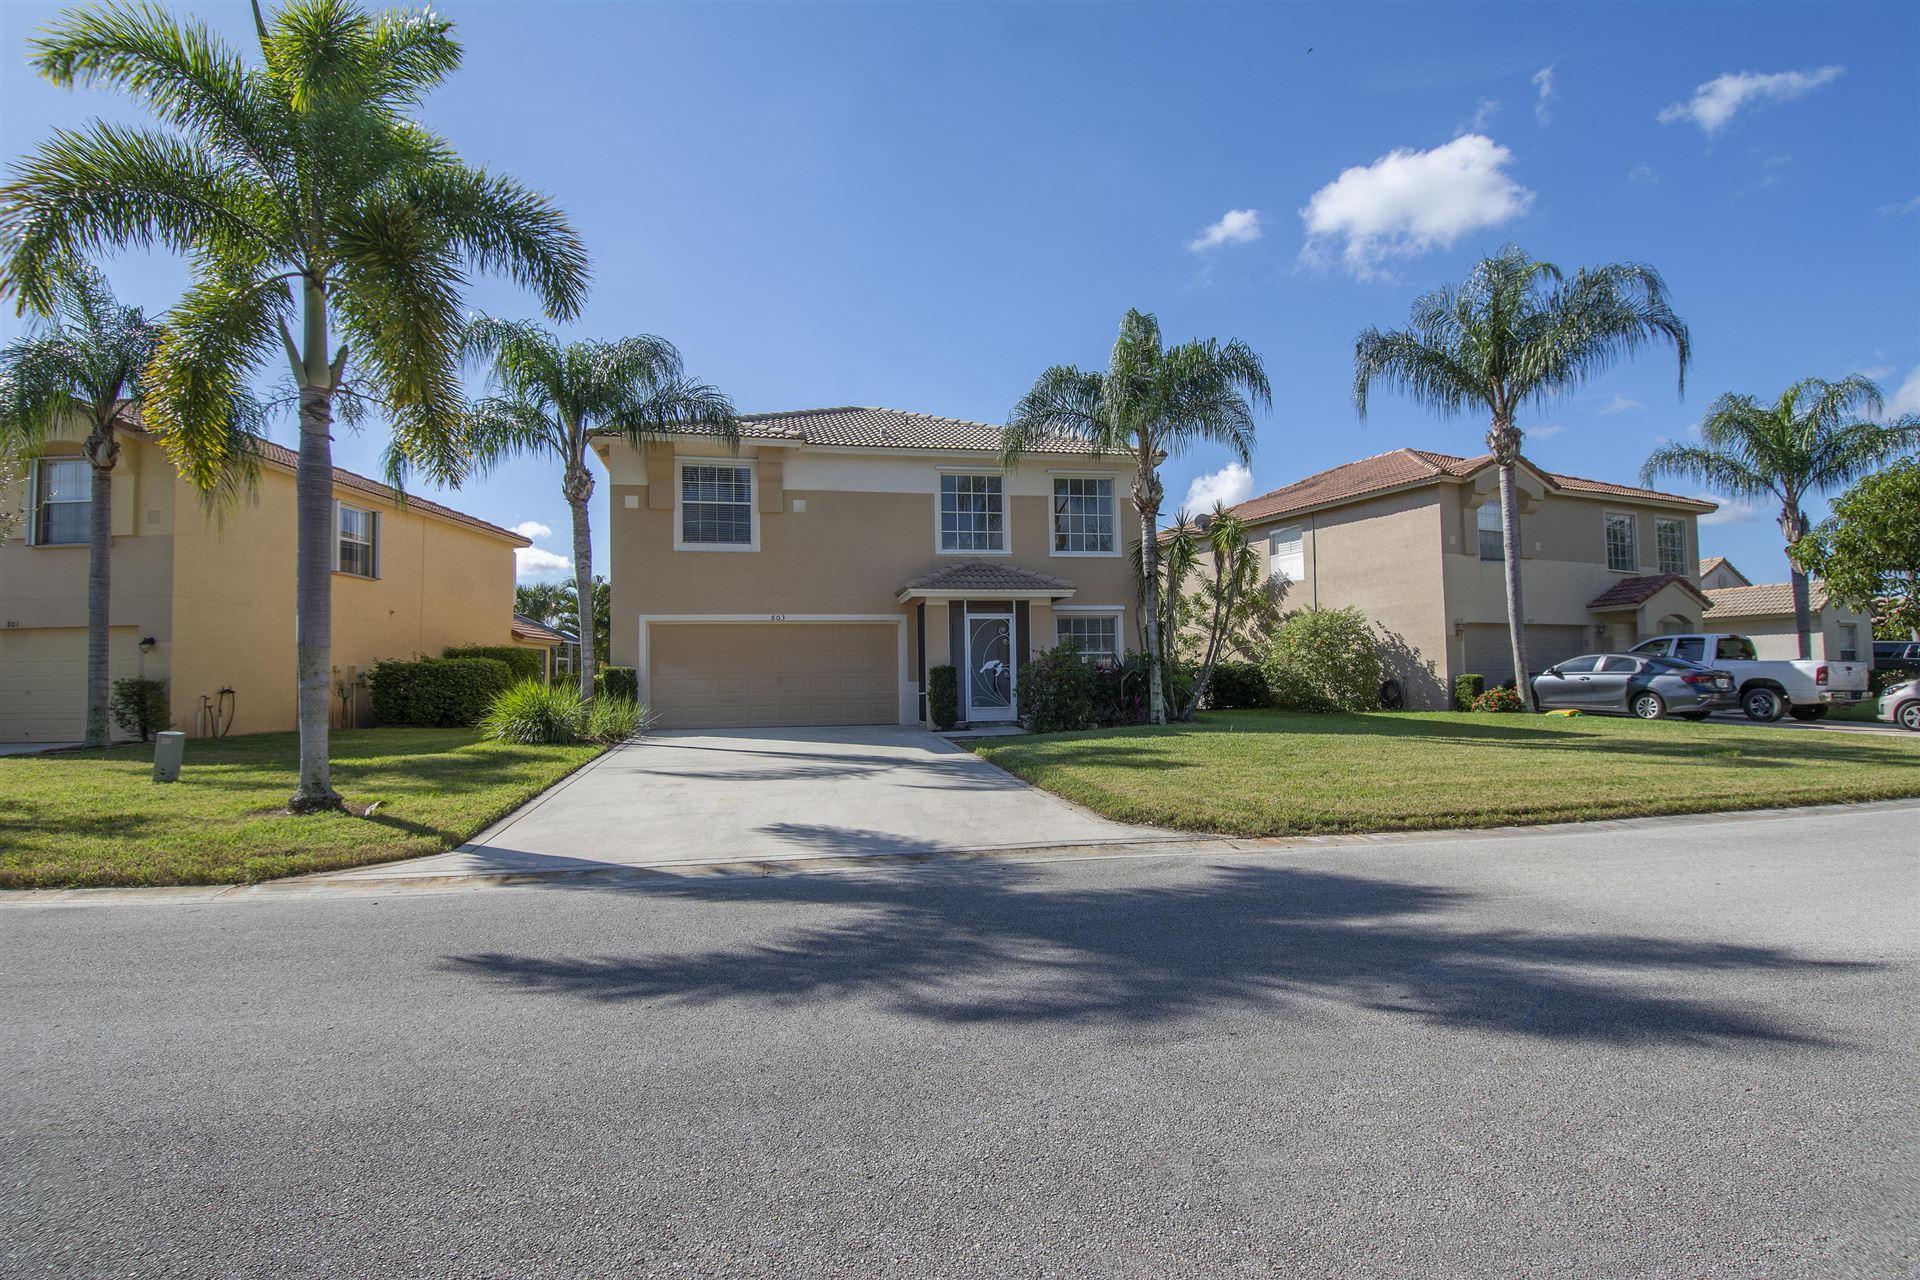 803 NW Greenwich Court, Port Saint Lucie, FL 34983 - #: RX-10674297